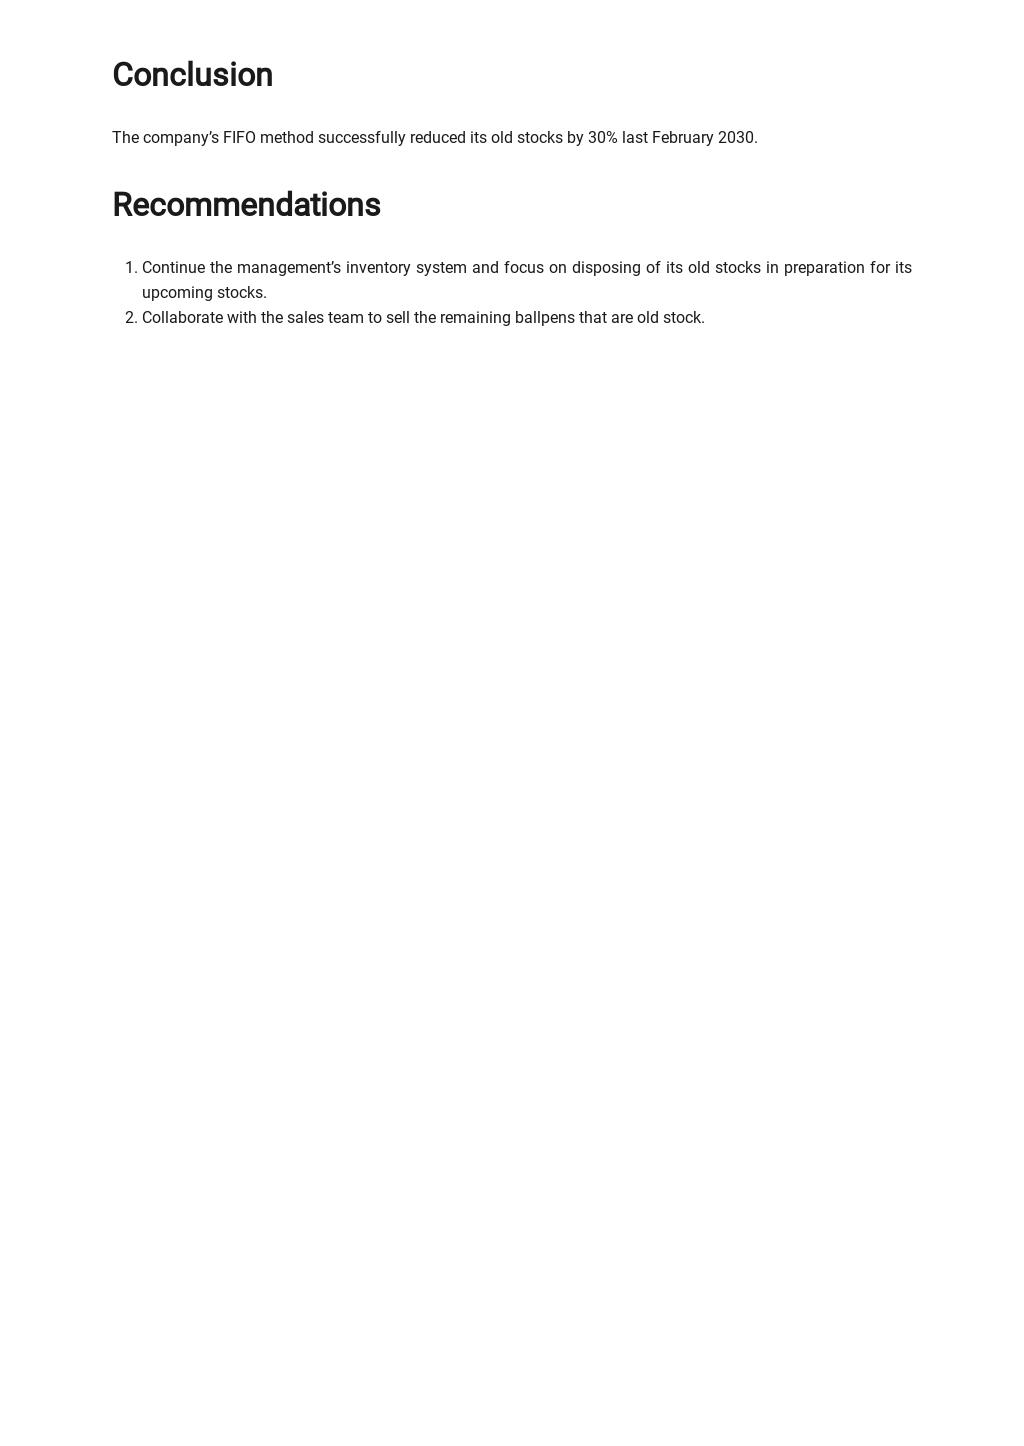 FREE Business Process Improvement Report Template - Google Docs, Word